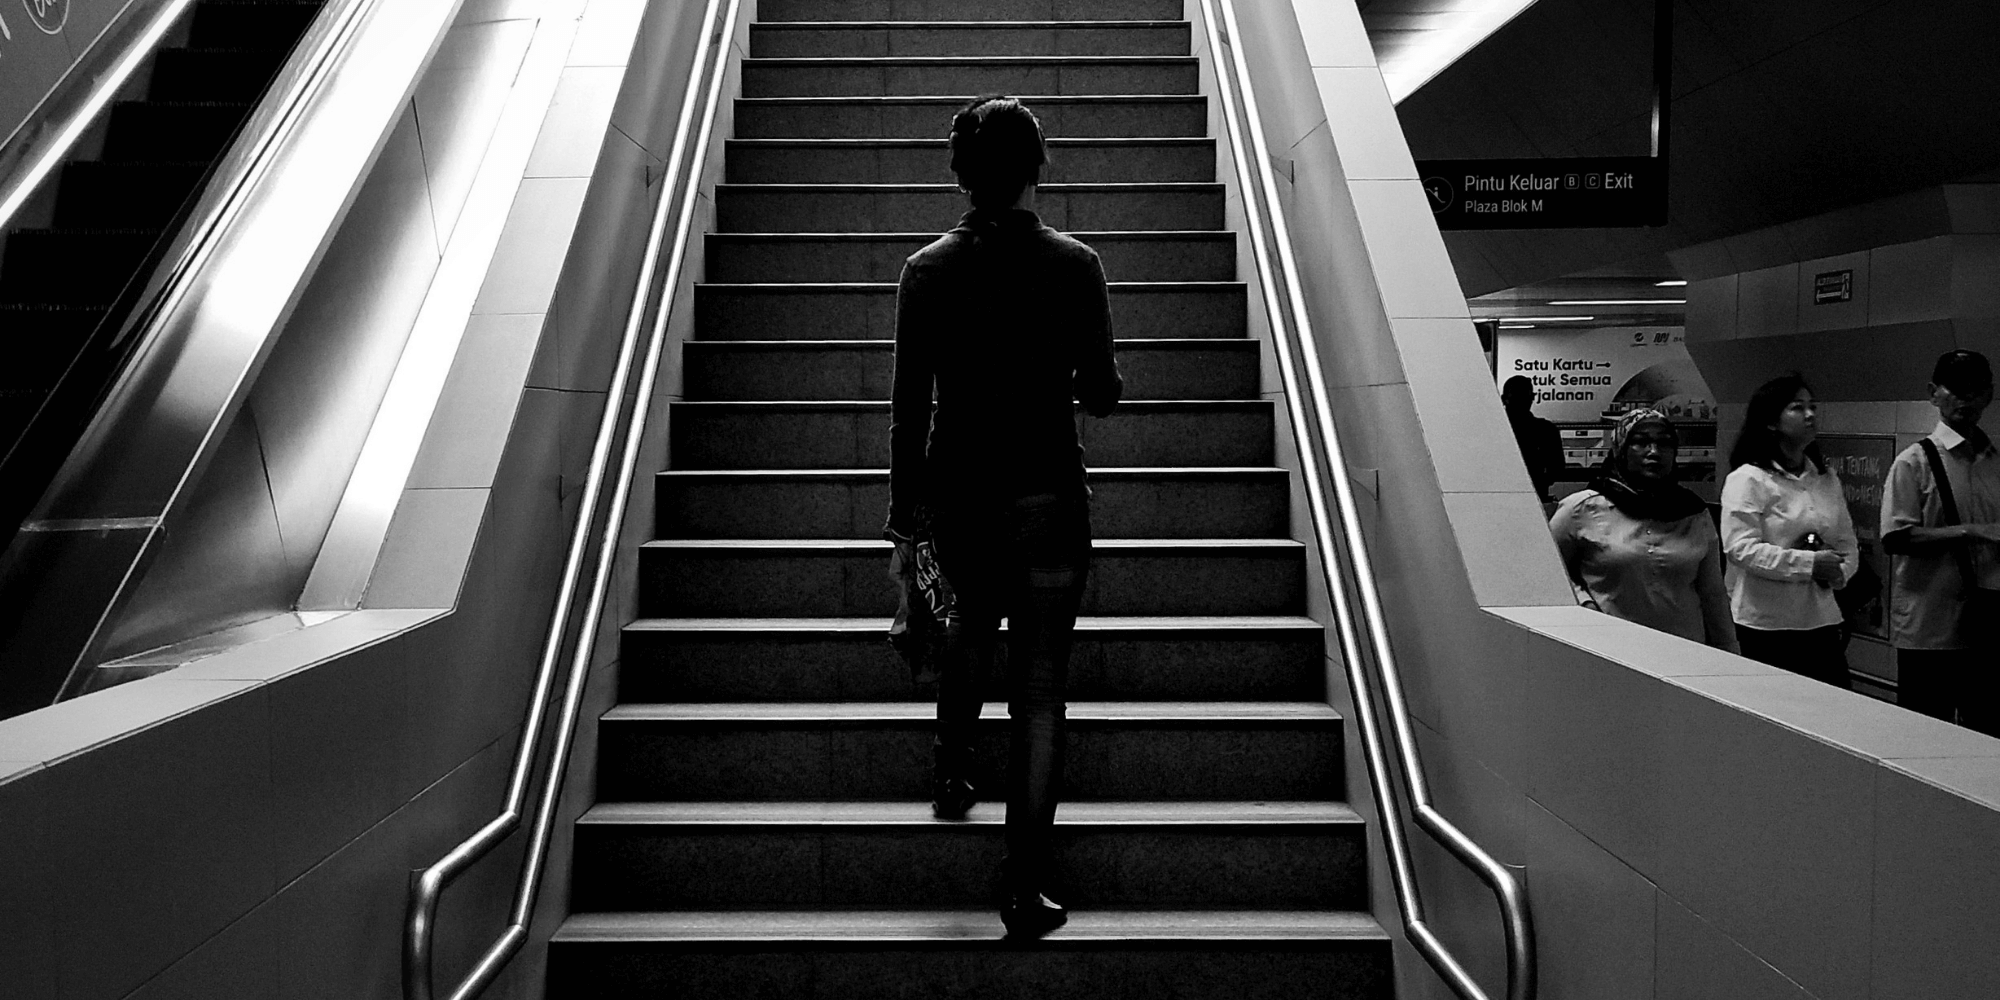 walking_up_stairs (1)